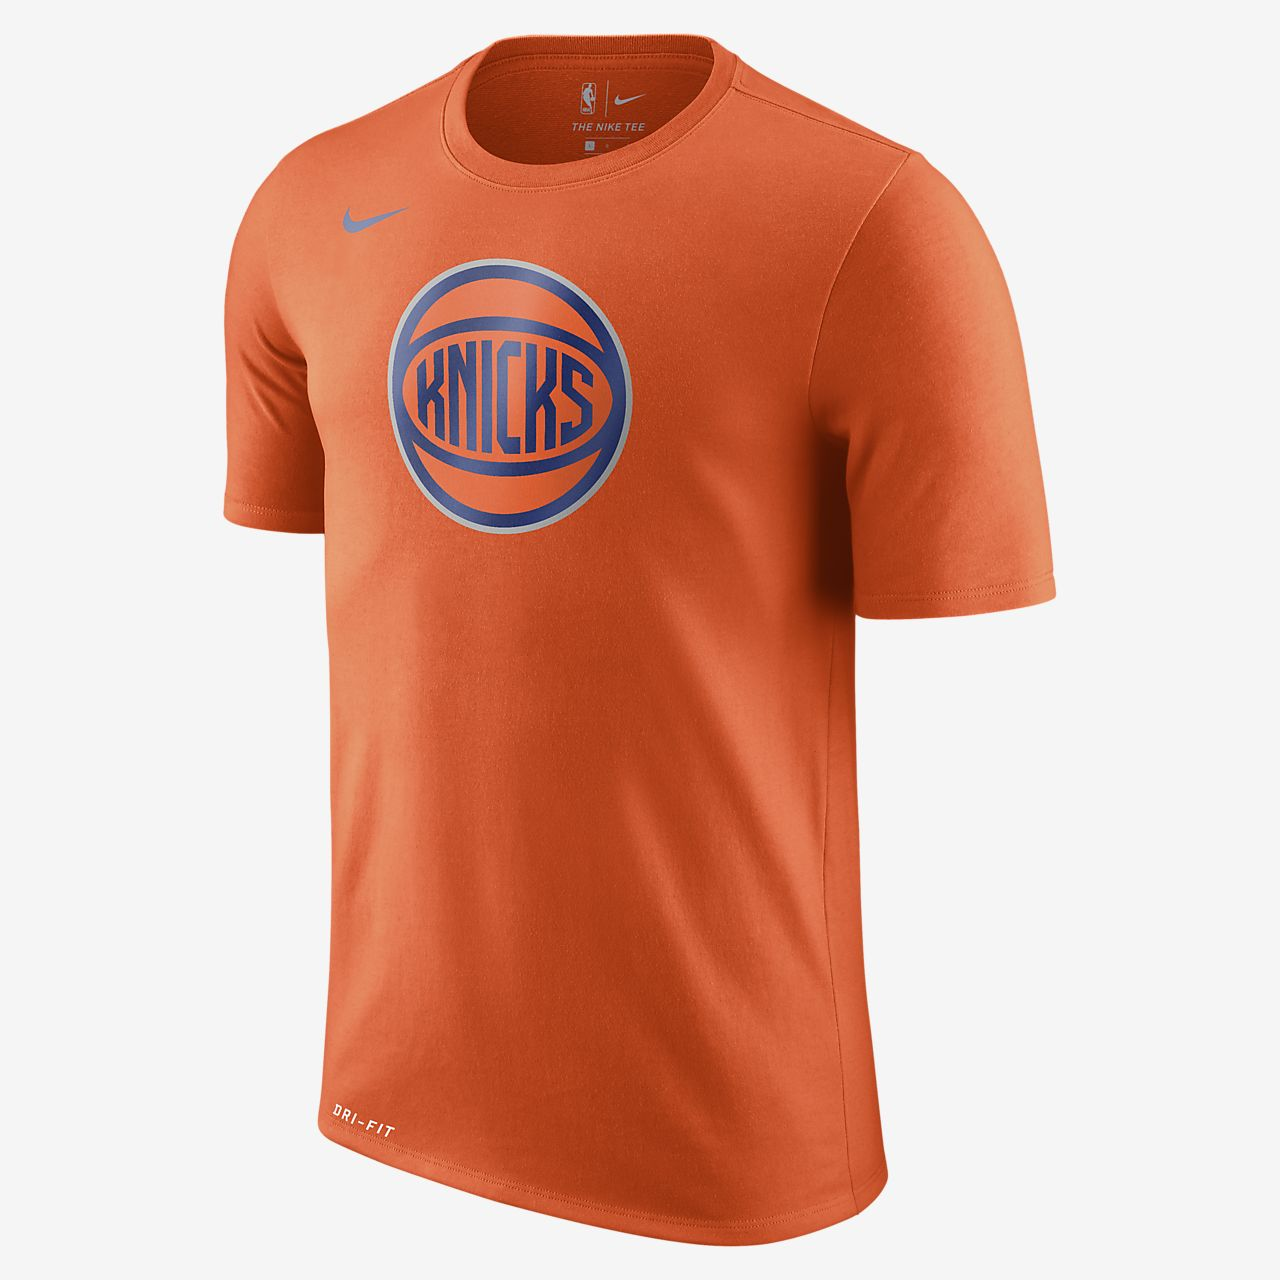 Shirt York T Men's Knicks NBA New Nike Logo Dry N8PknOw0ZX